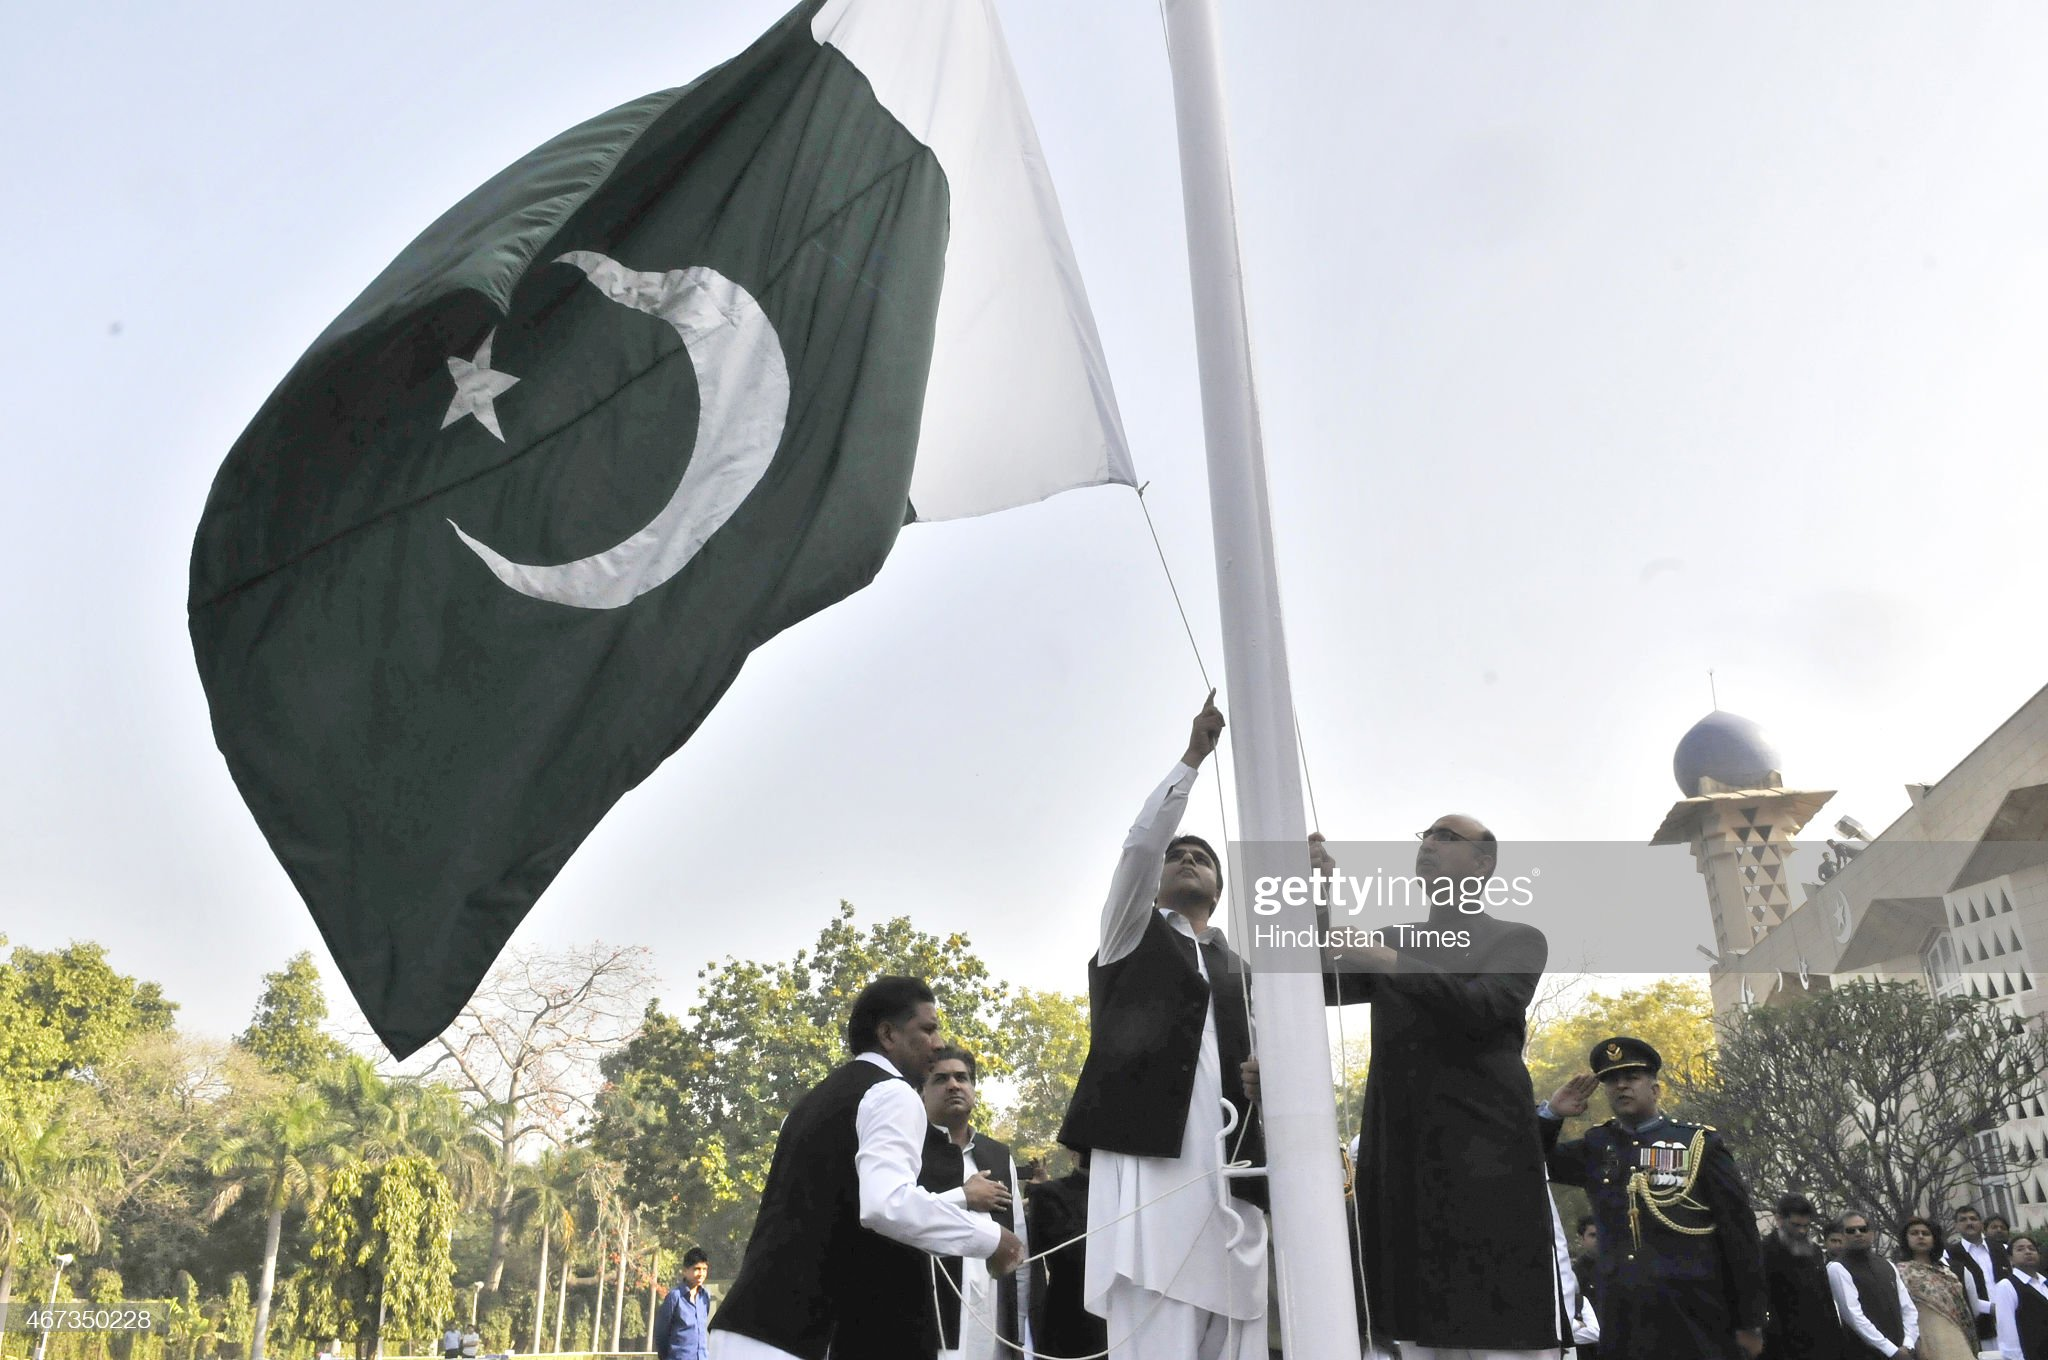 Pakistan National Day Reception At The Pakistani High Commission : News Photo